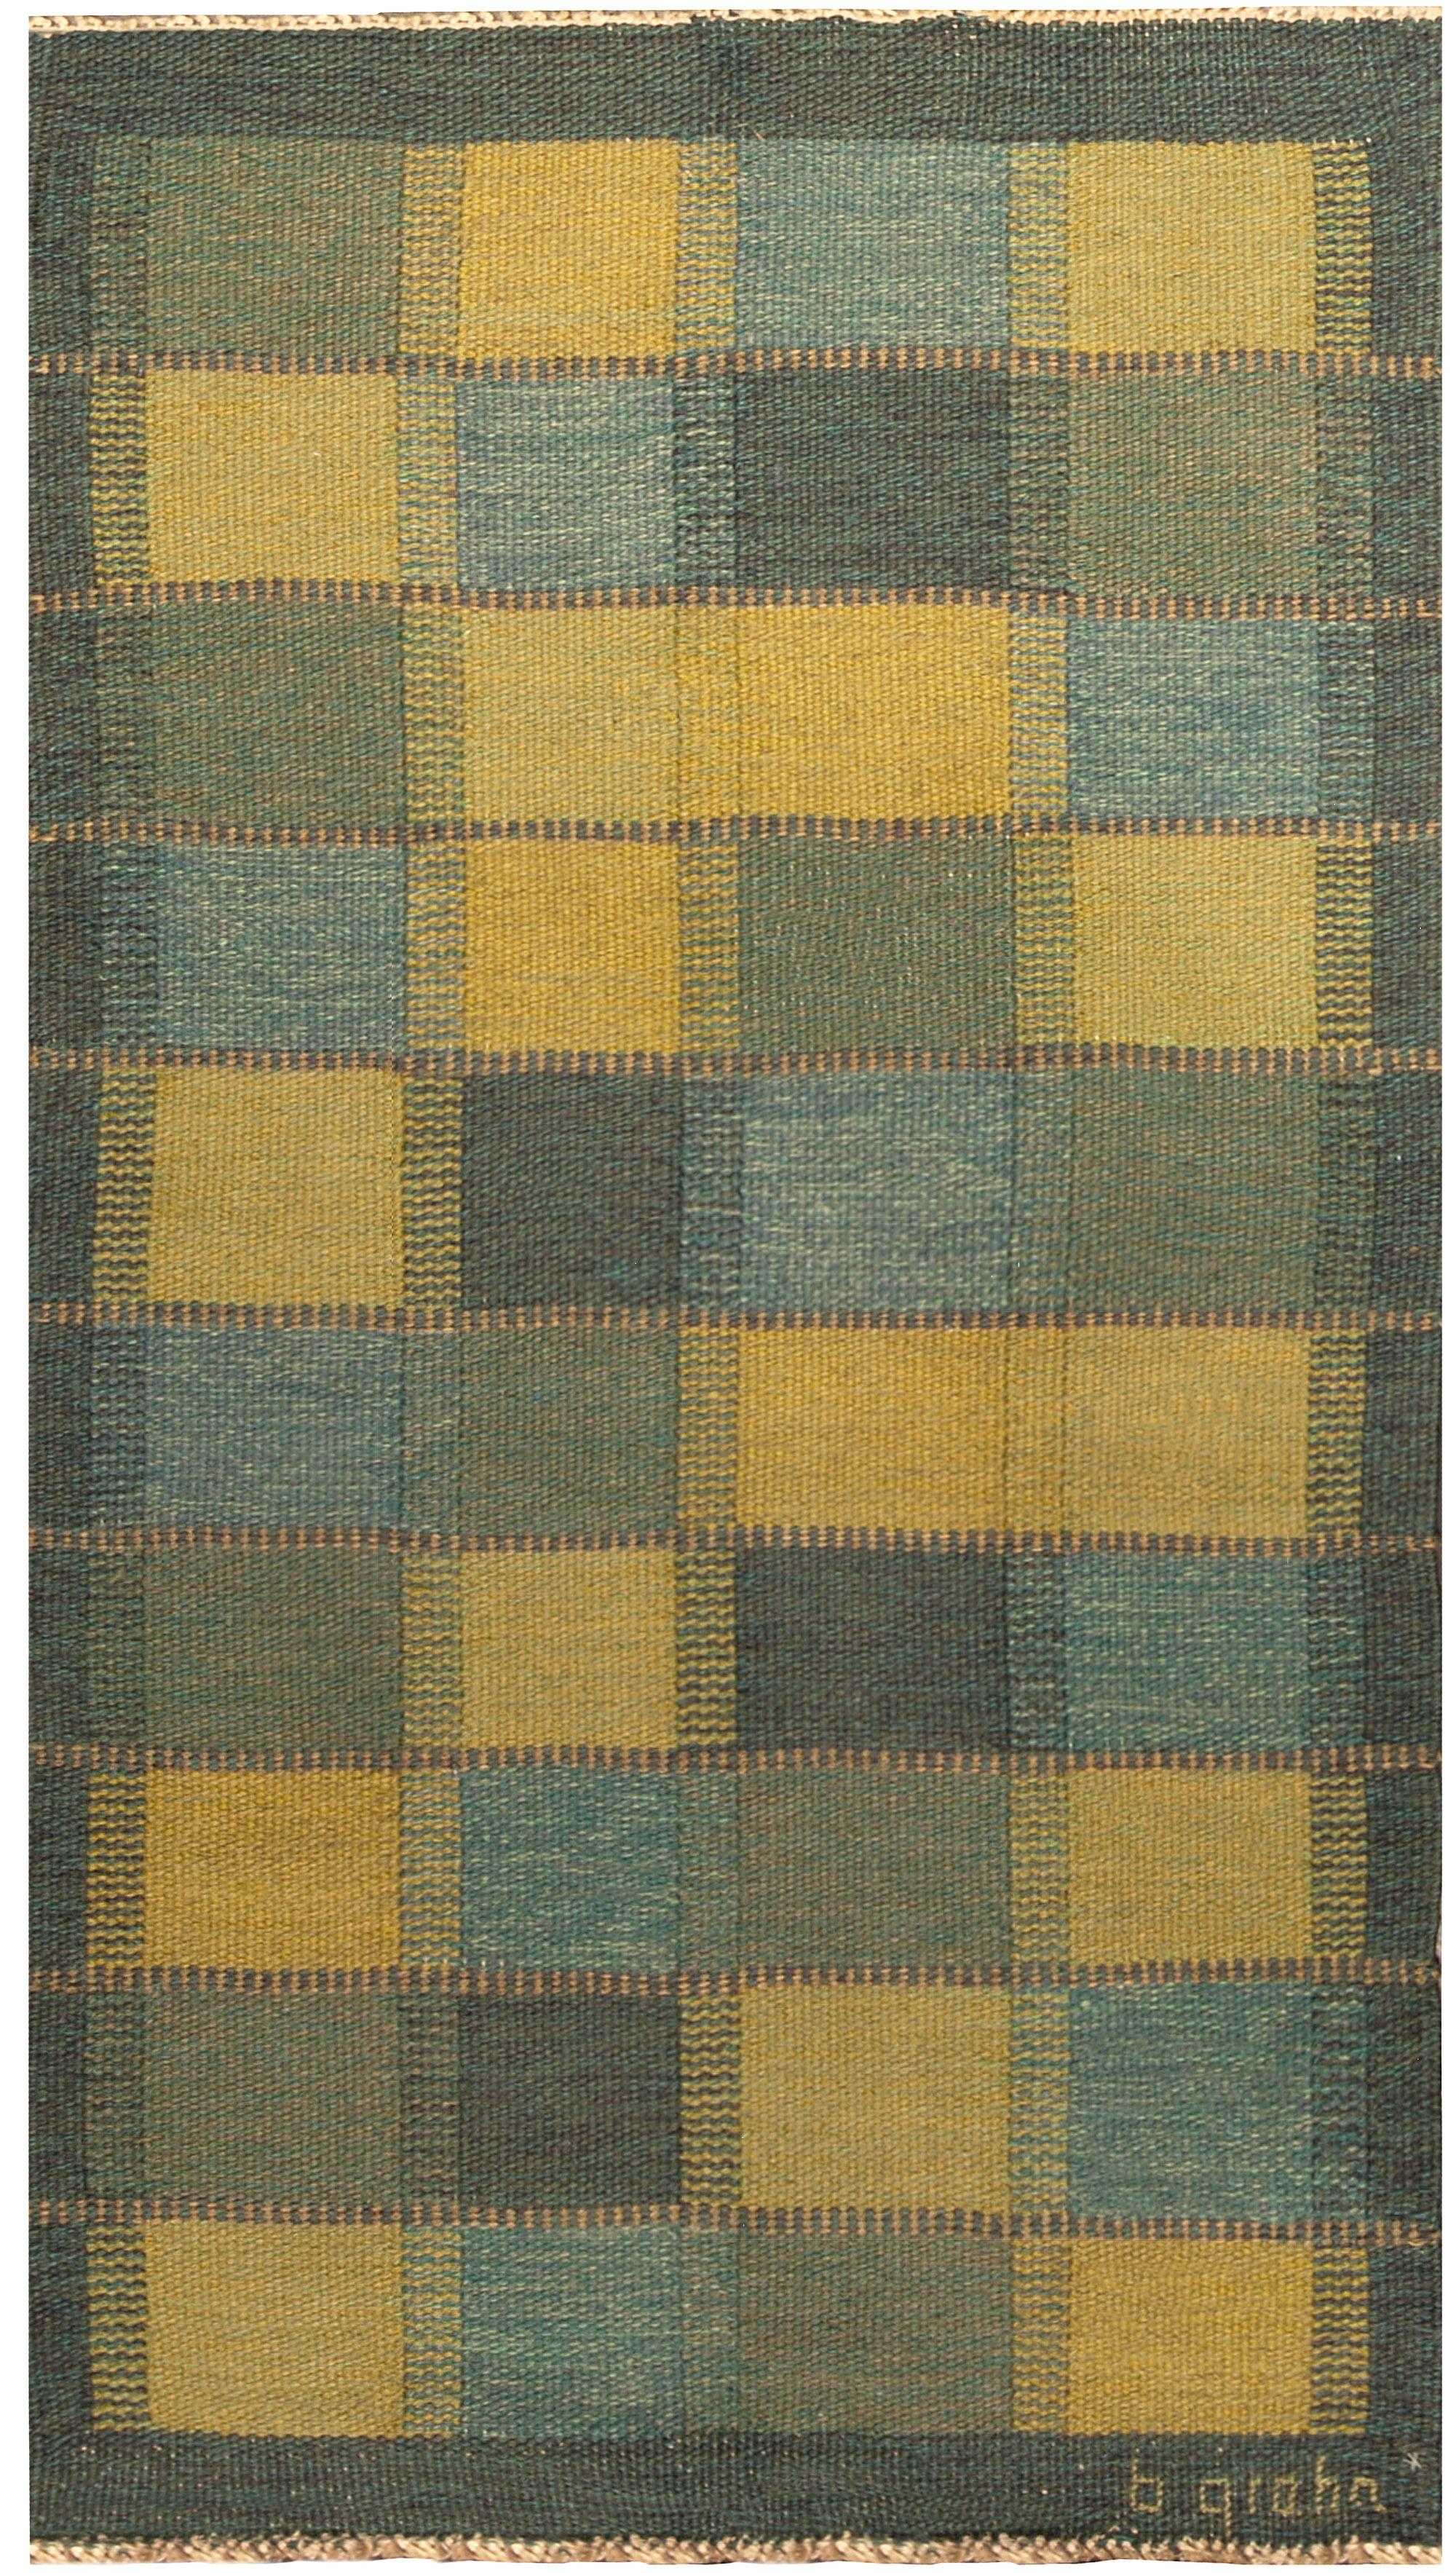 Vintage Swedish Flat Woven Rug BB4802